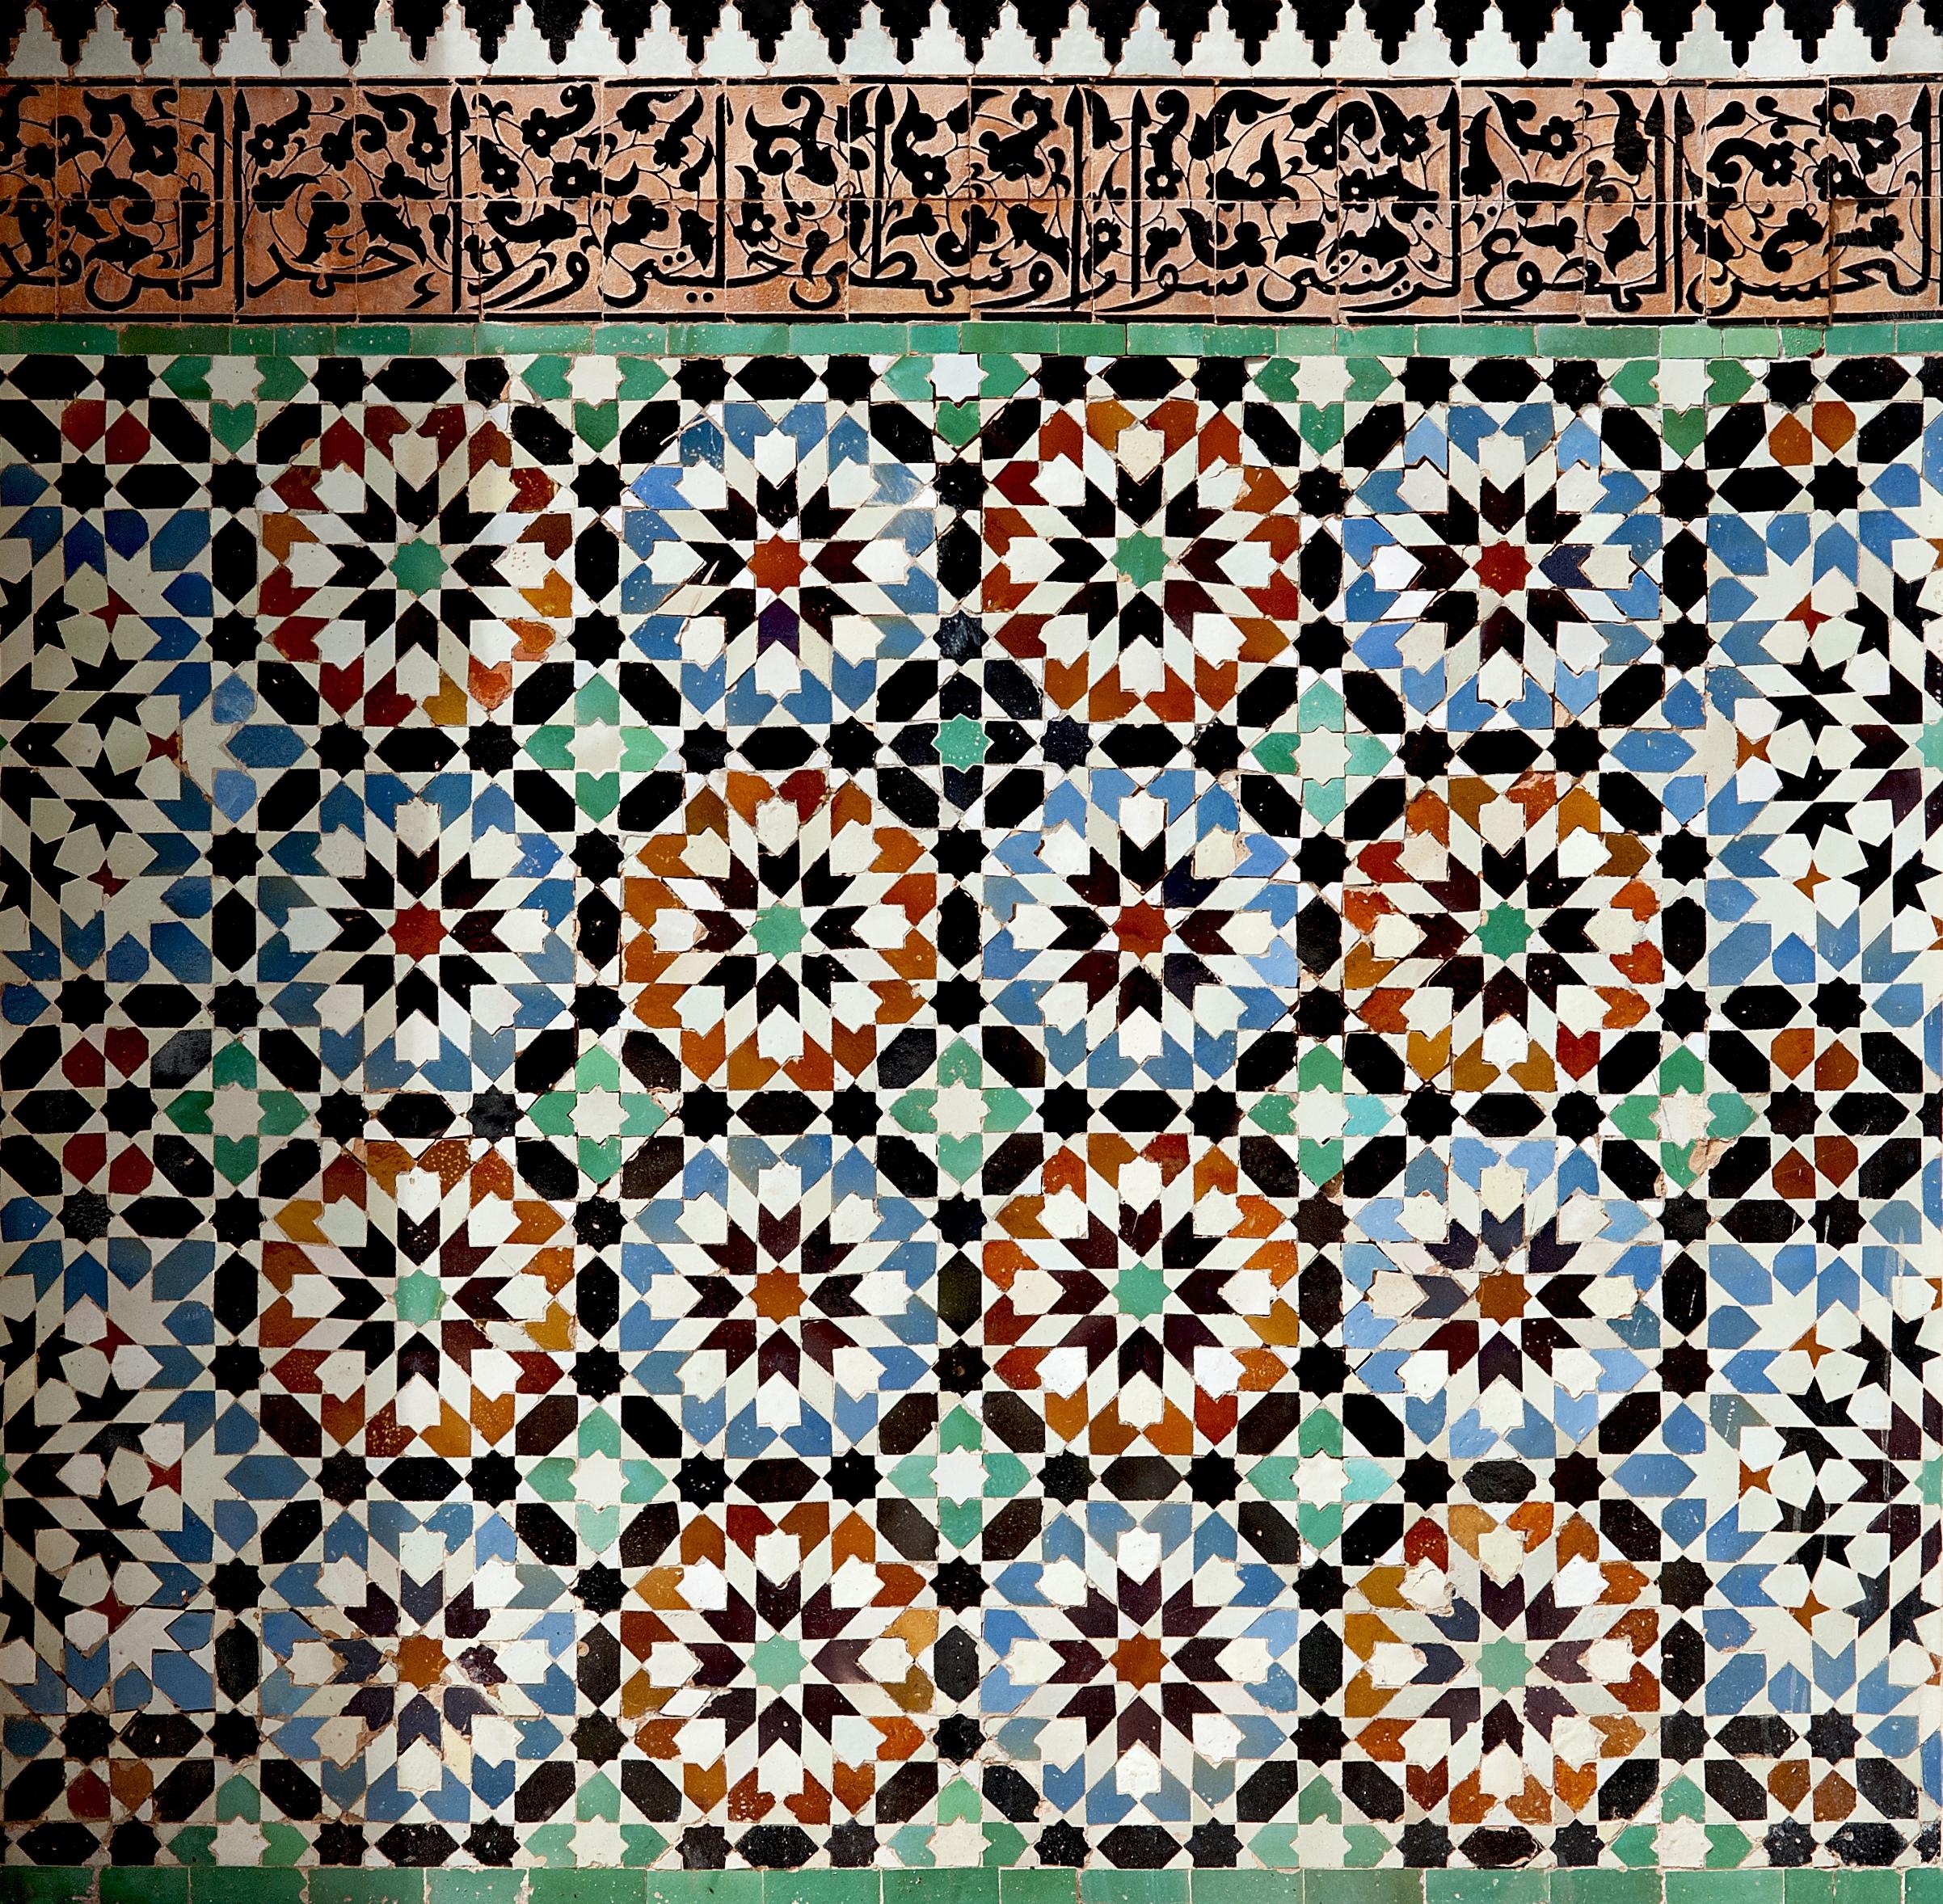 Islamic geometric mosaic